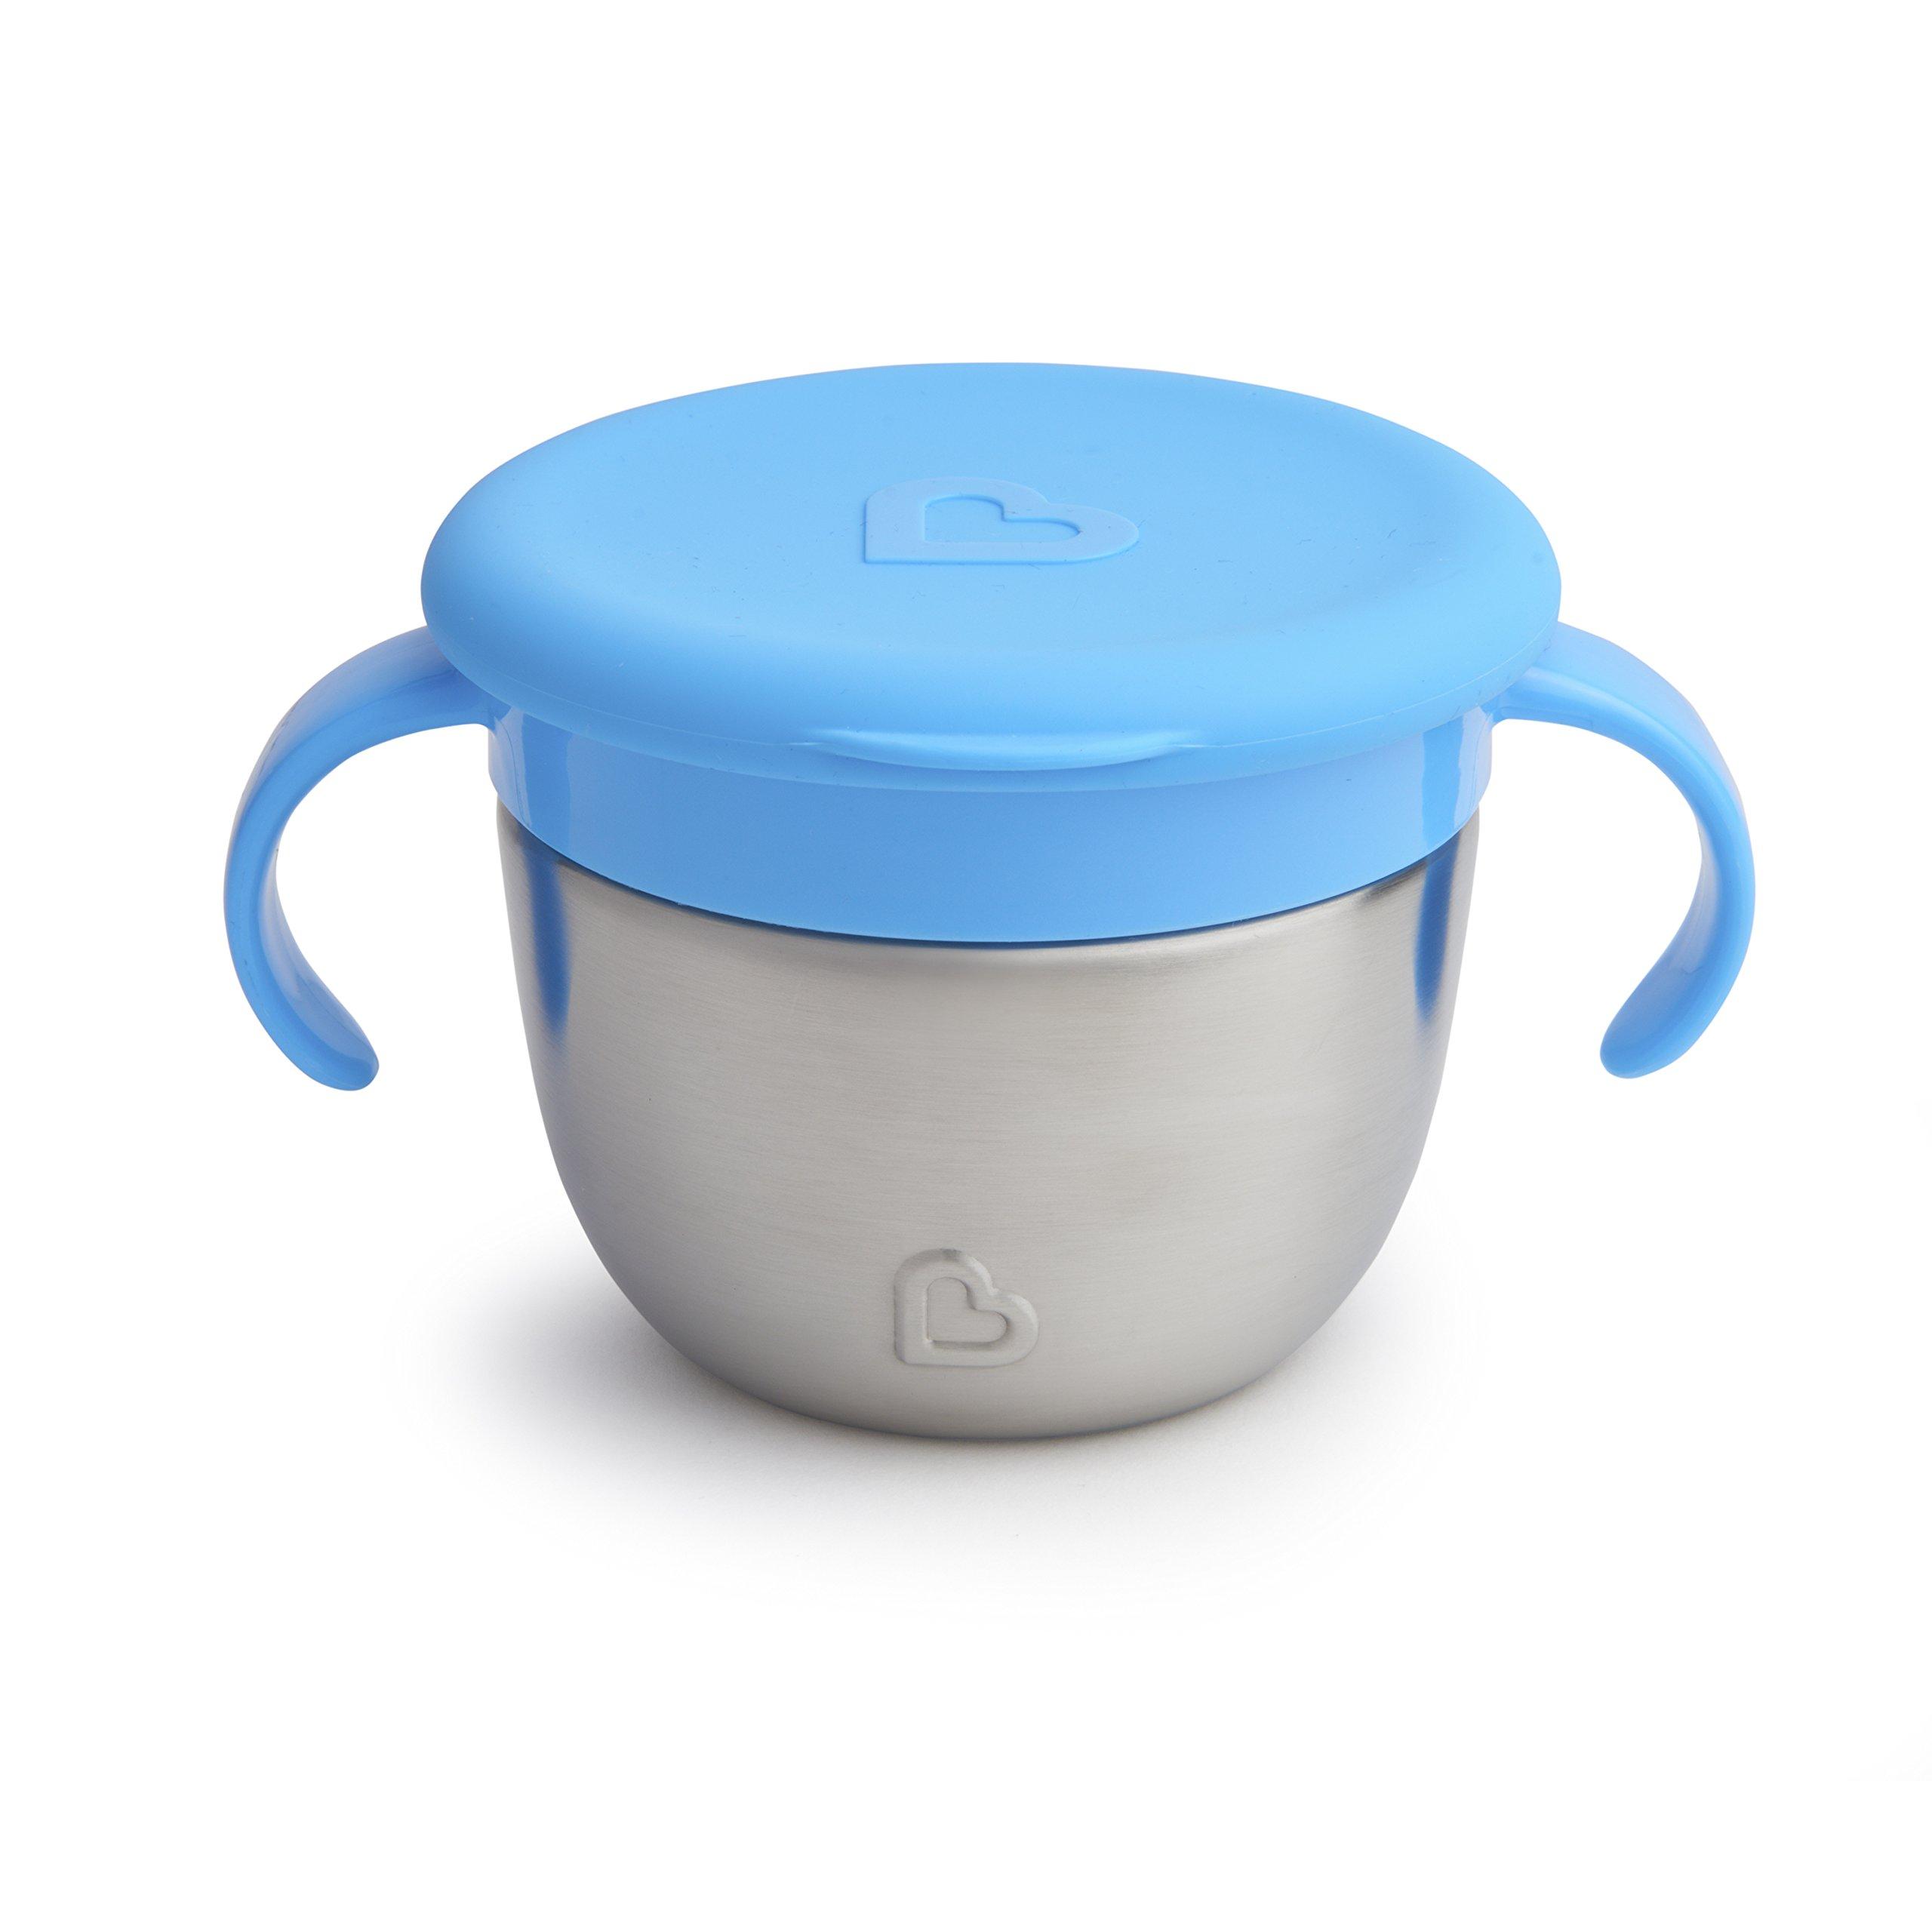 Munchkin Snack Plus Stainless SteelSnackCatcher, Blue